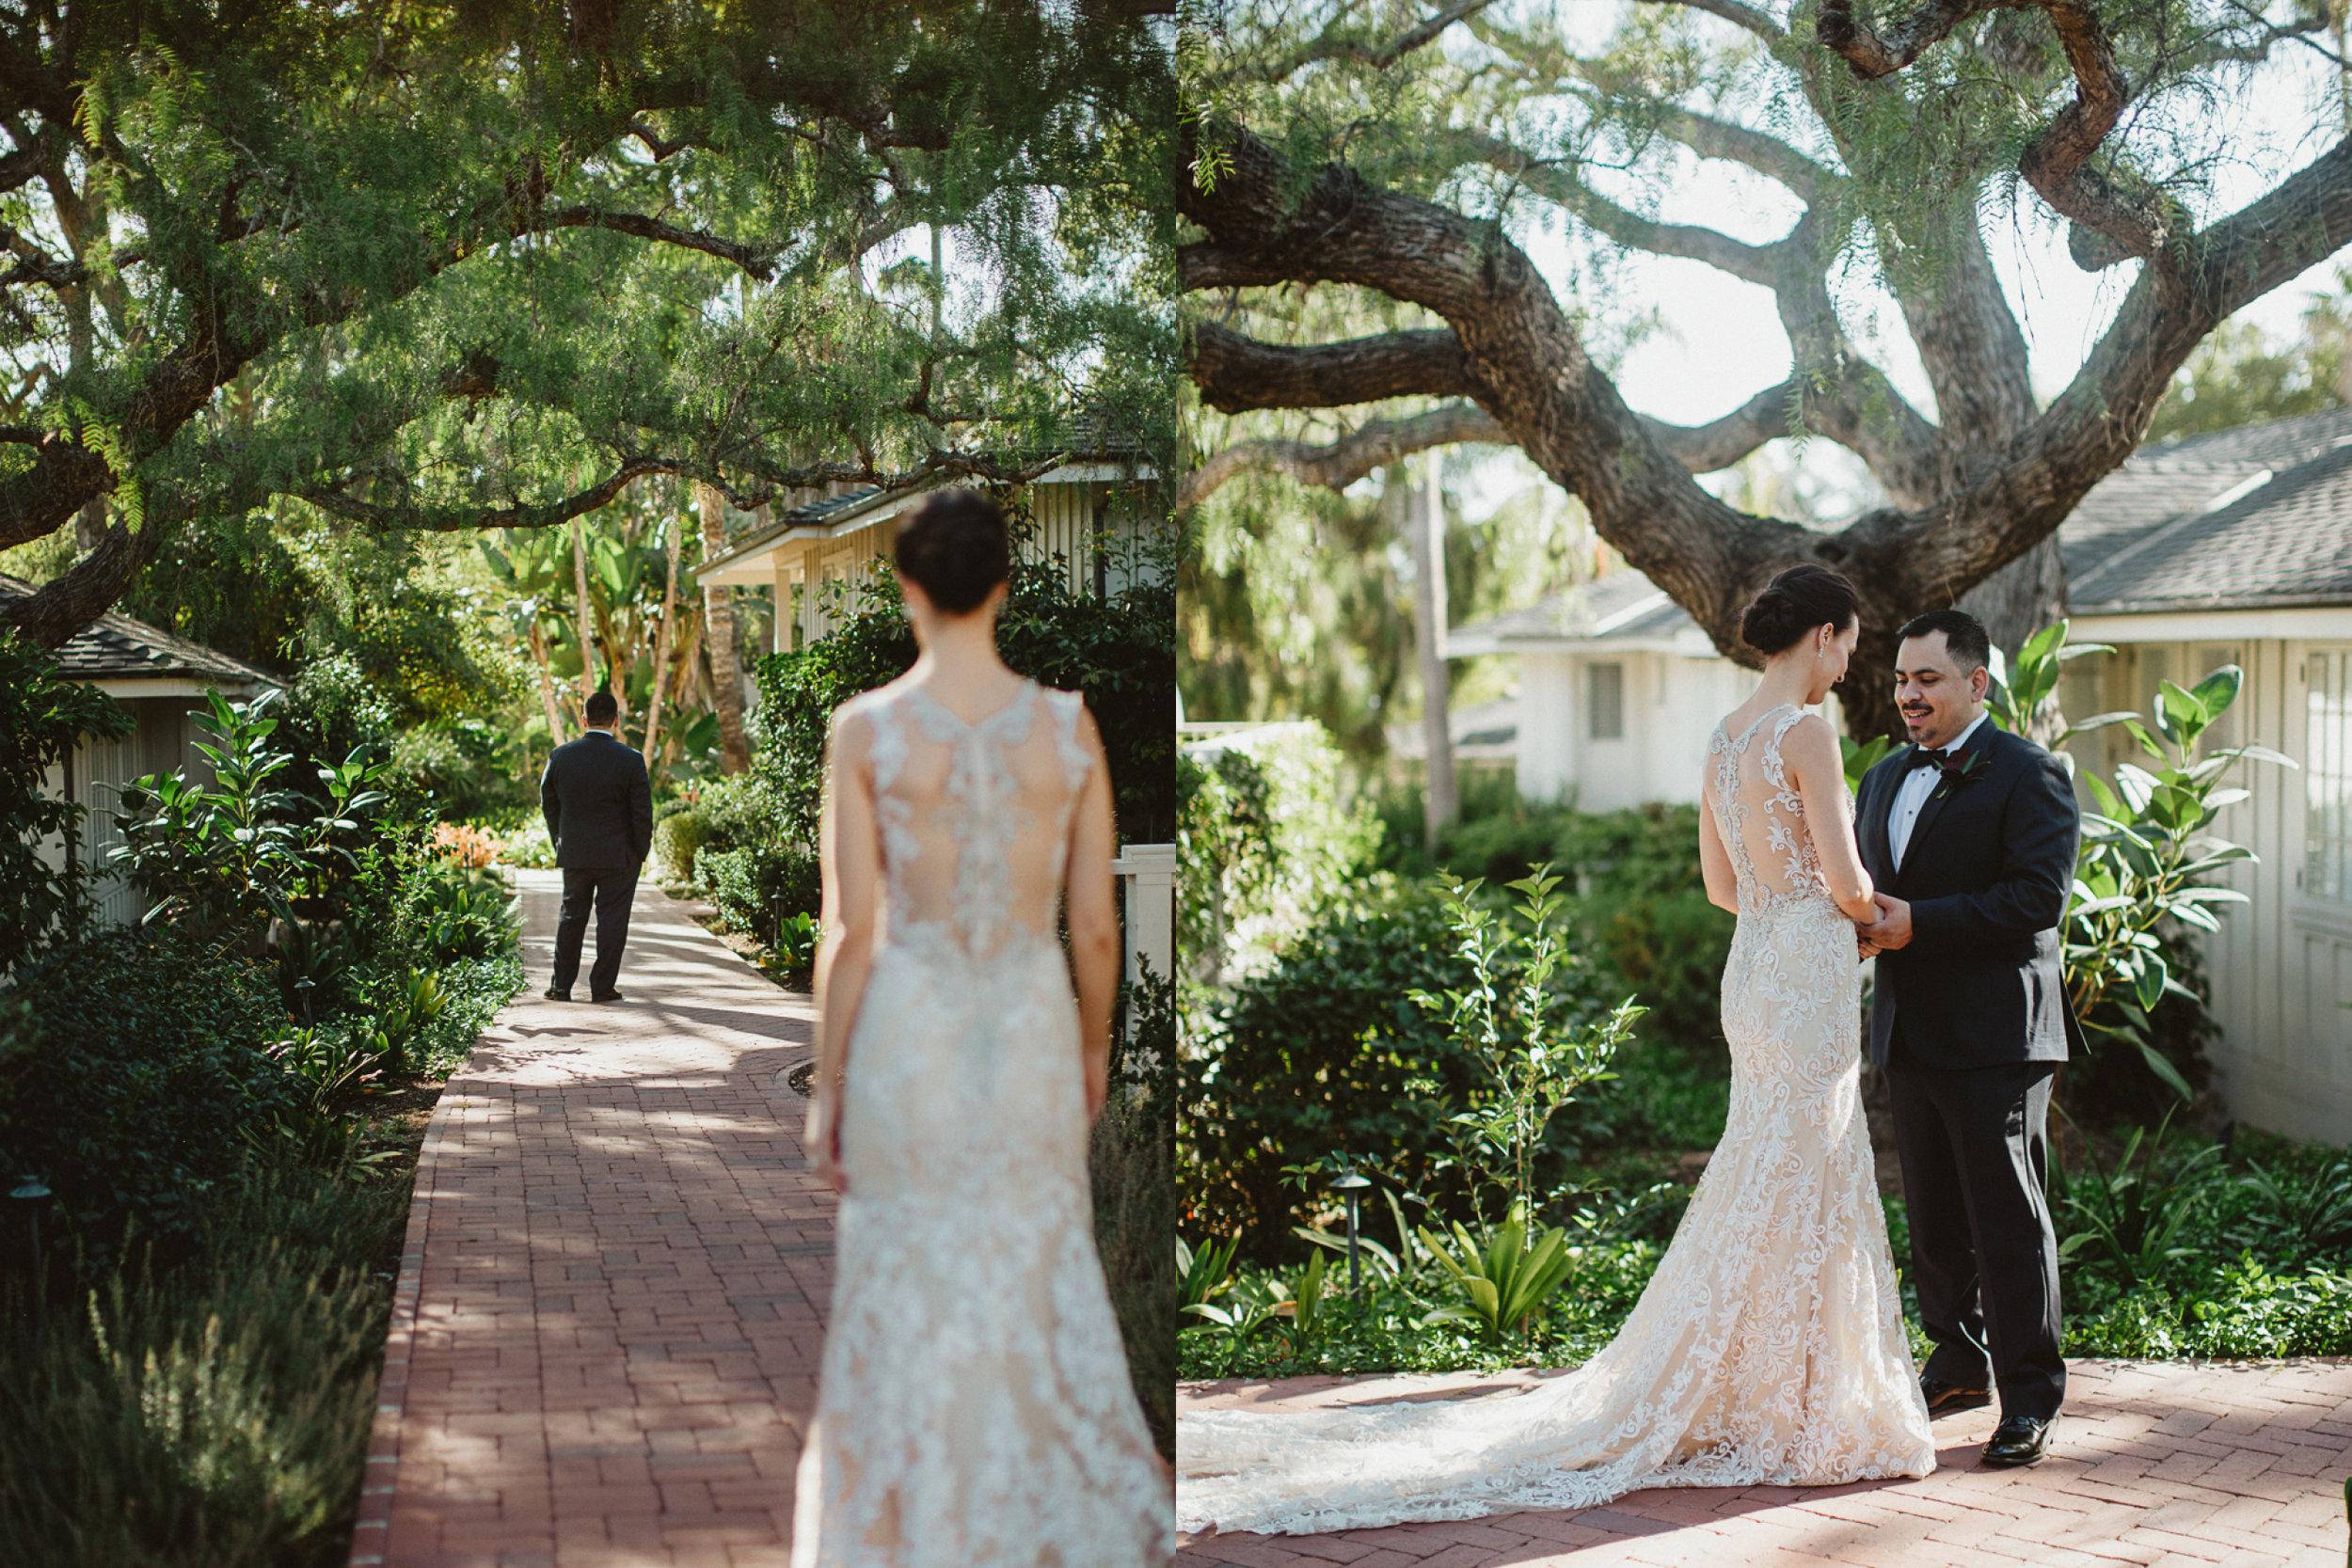 santa-barbara-elopement-elope-alegria-design-event-planner-coordinator-day-of-el-encanto-resort-lily-pond-wedding-intimate-red-maroon-city-ocean-view-rooftop (12).jpg